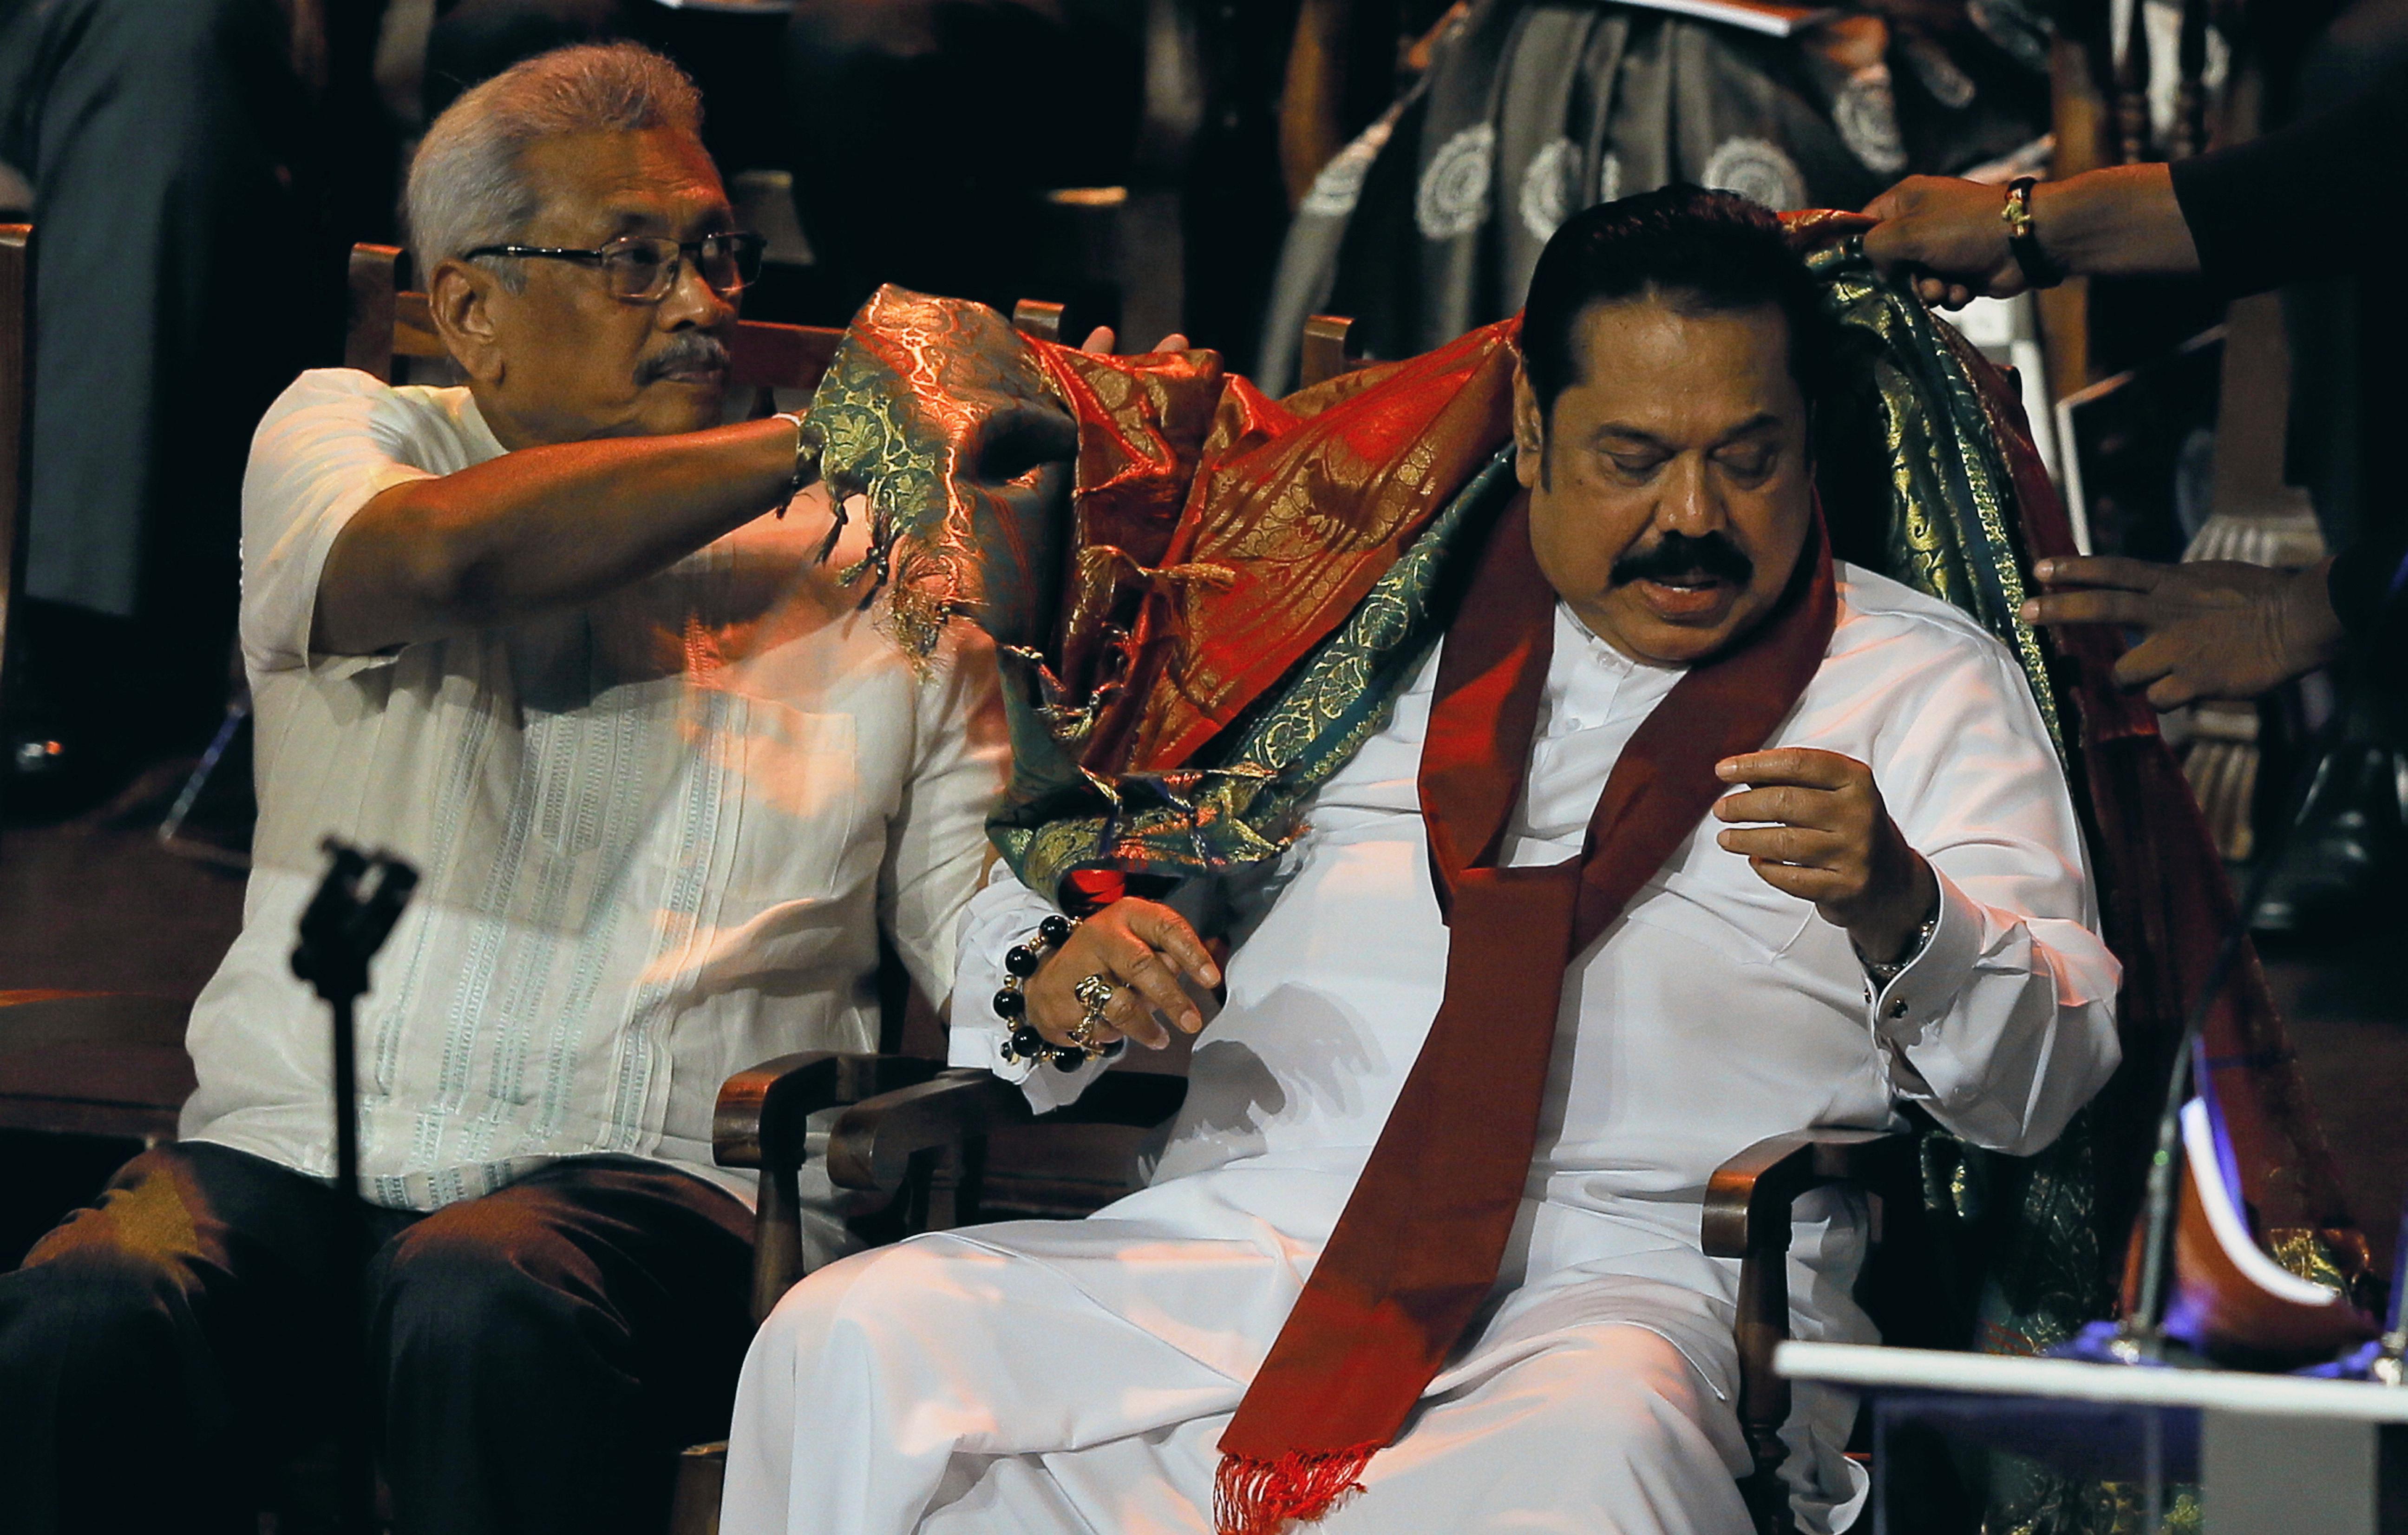 Sri Lanka's Mahinda Rajapaksa to be sworn in as PM by his brother